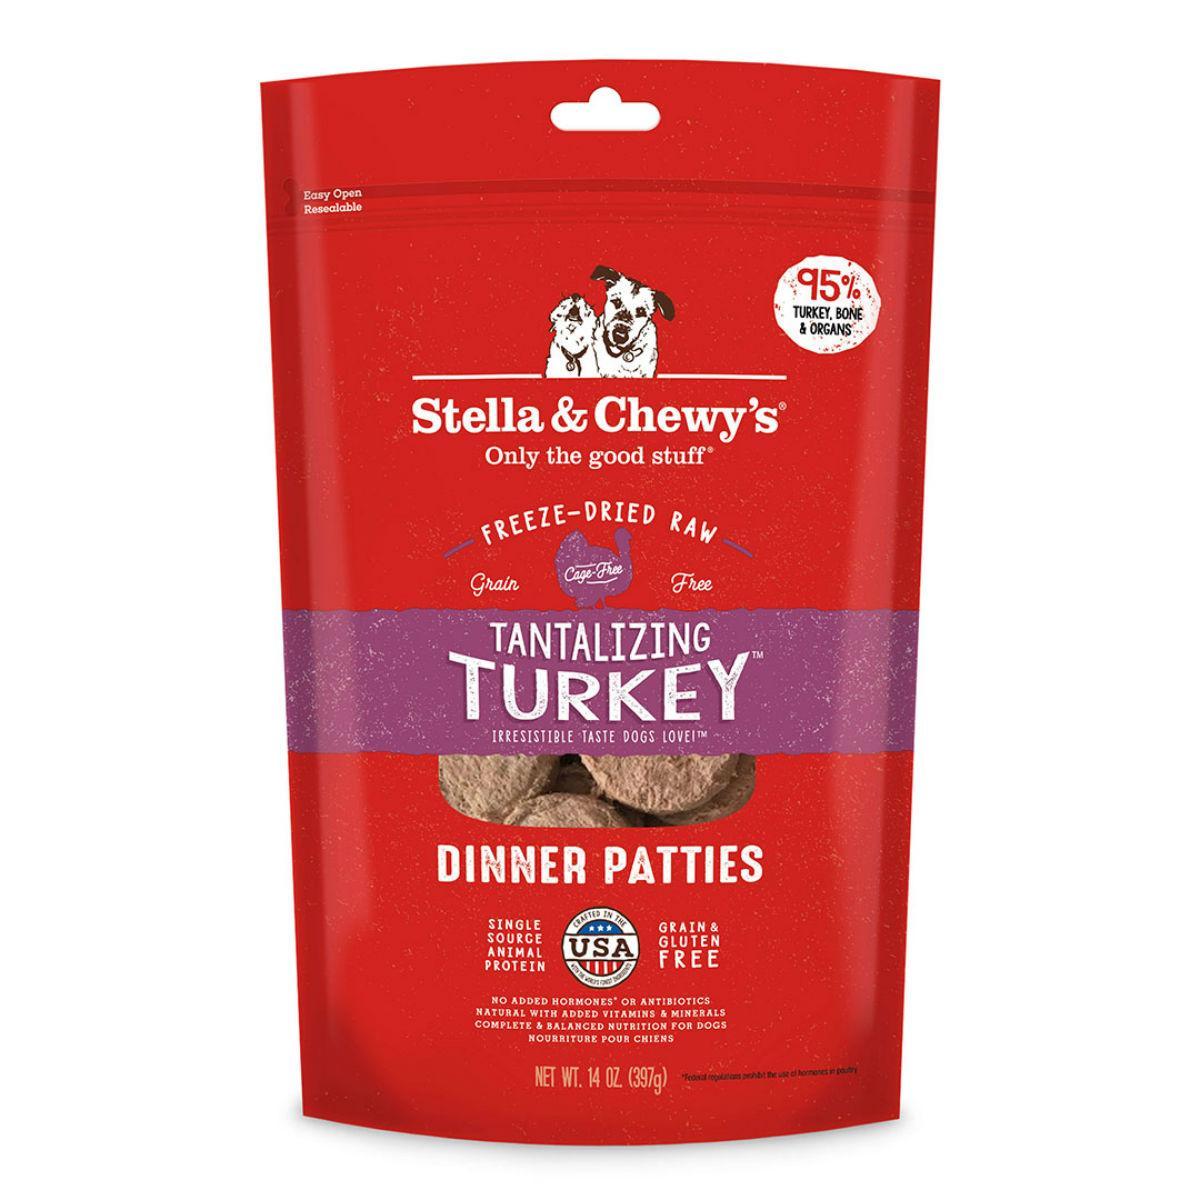 Stella & Chewy's Tantalizing Turkey Dinner Patties Dog Treat - Freeze Dried